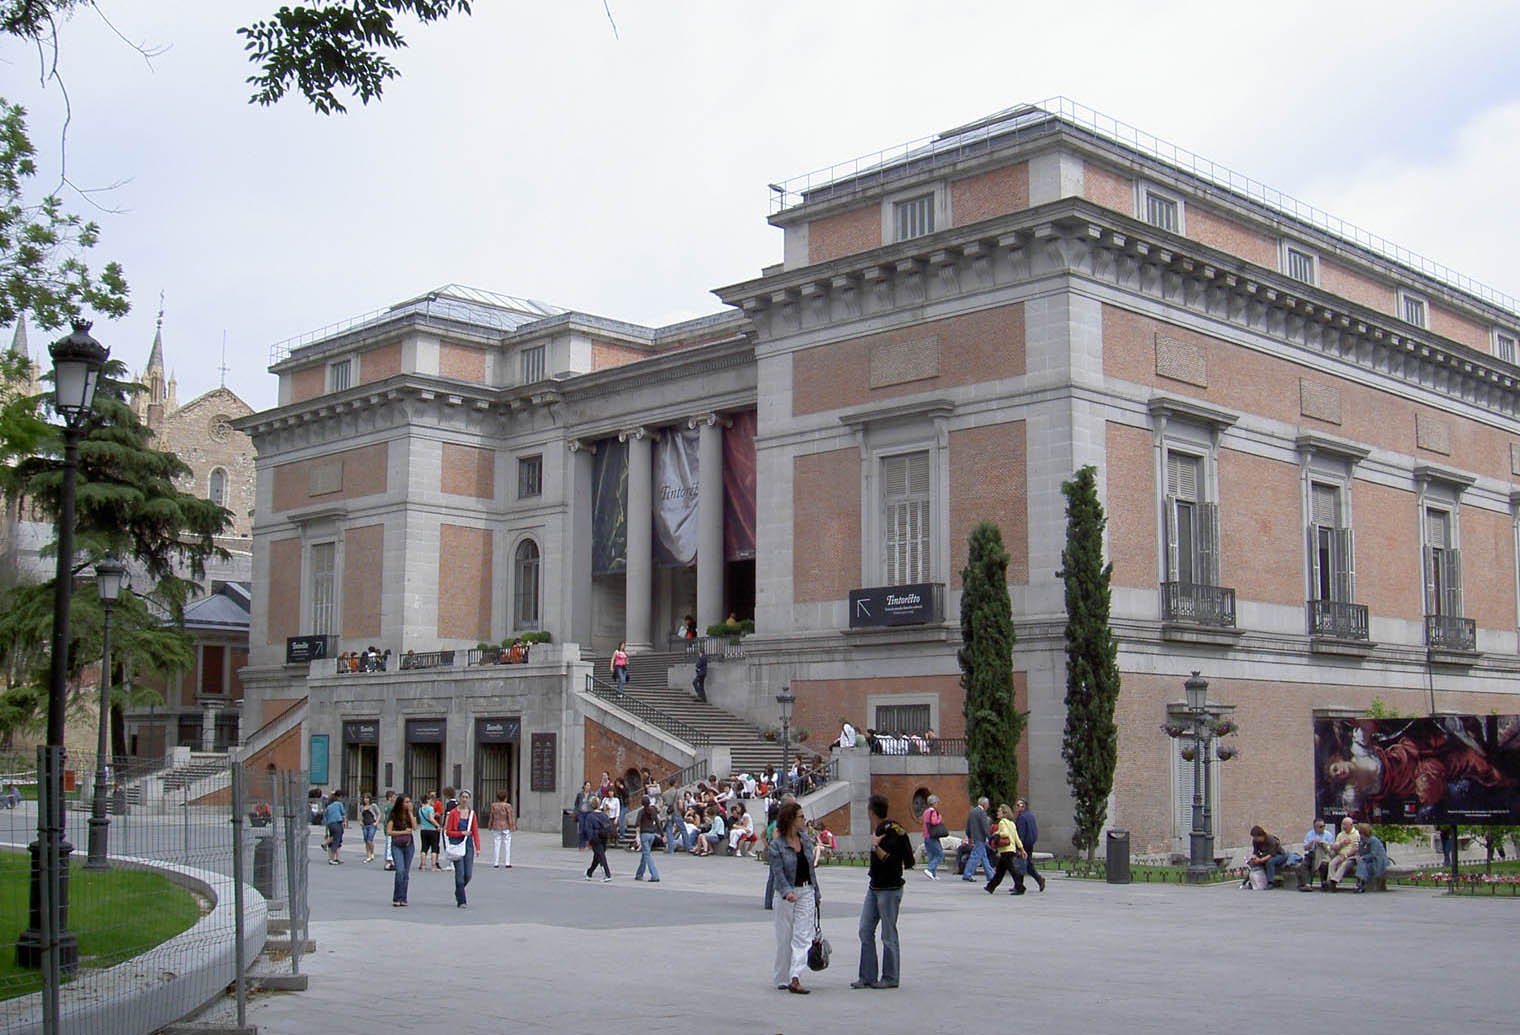 02 museo del prado folia for Calle prado jerez madrid